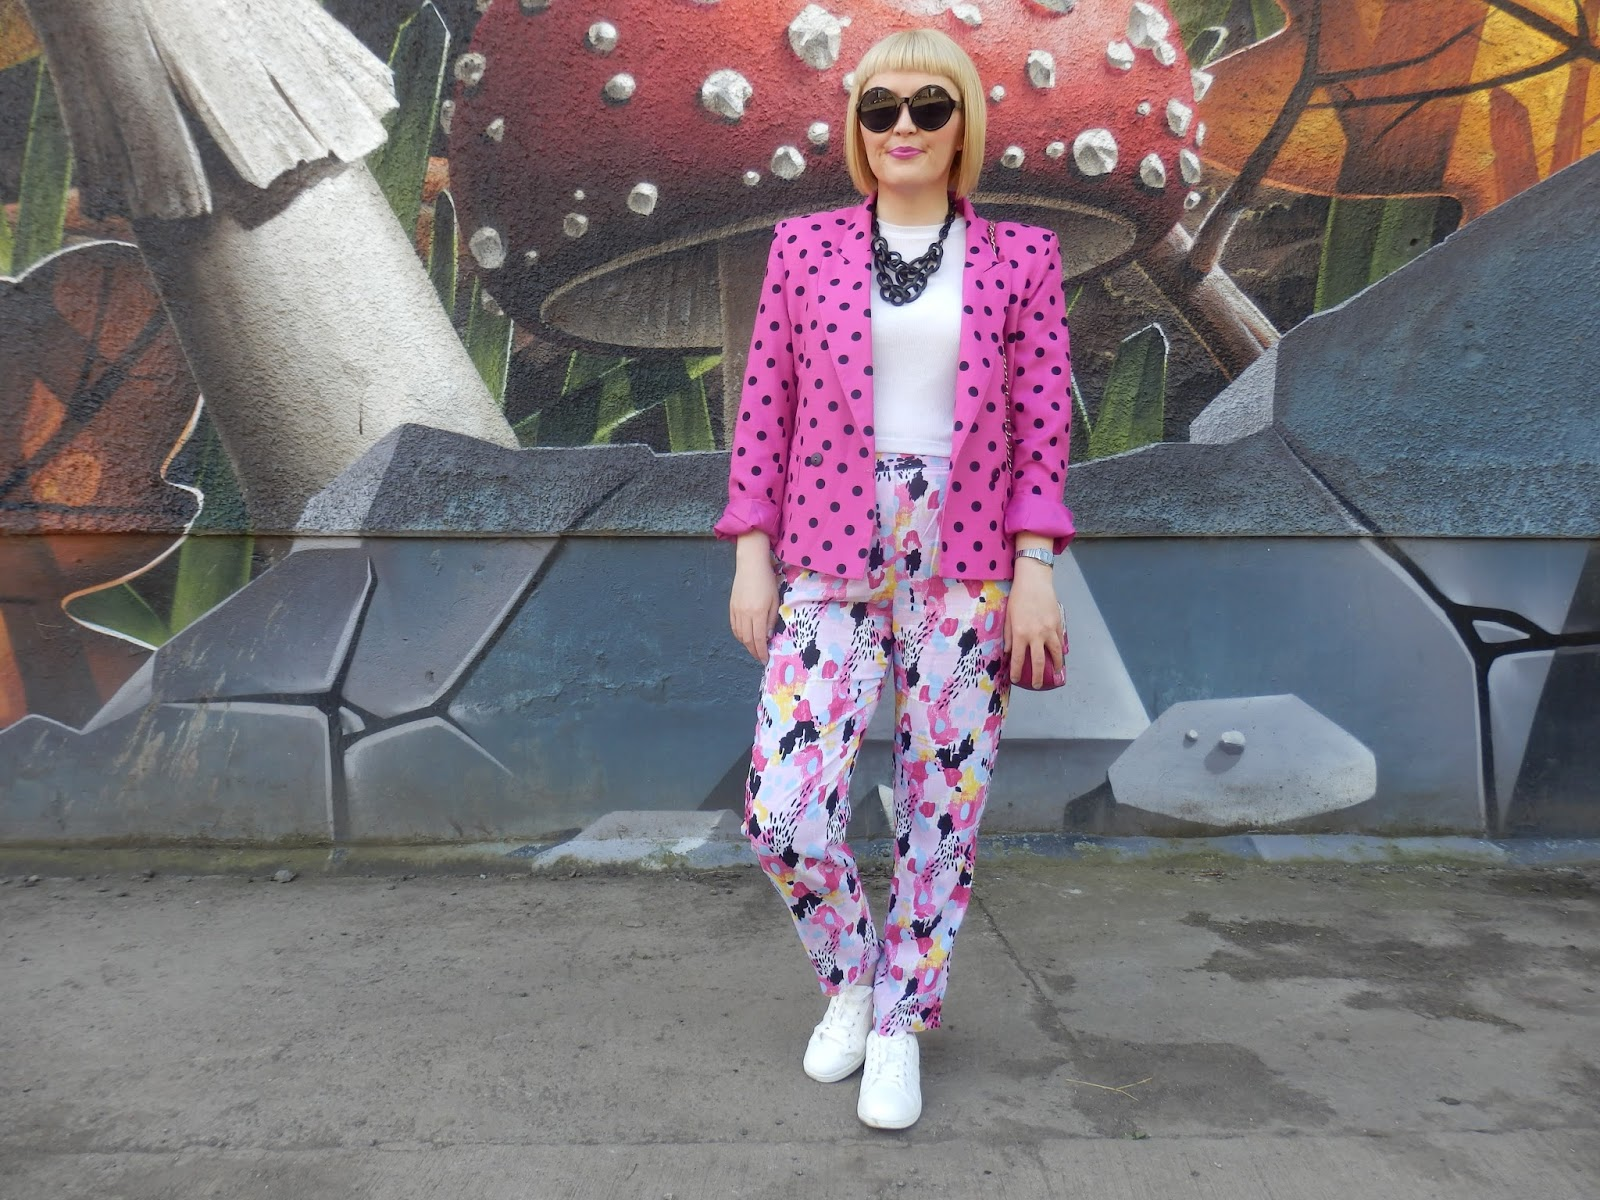 Glasgowfashiongirl - Dotty About Vintage